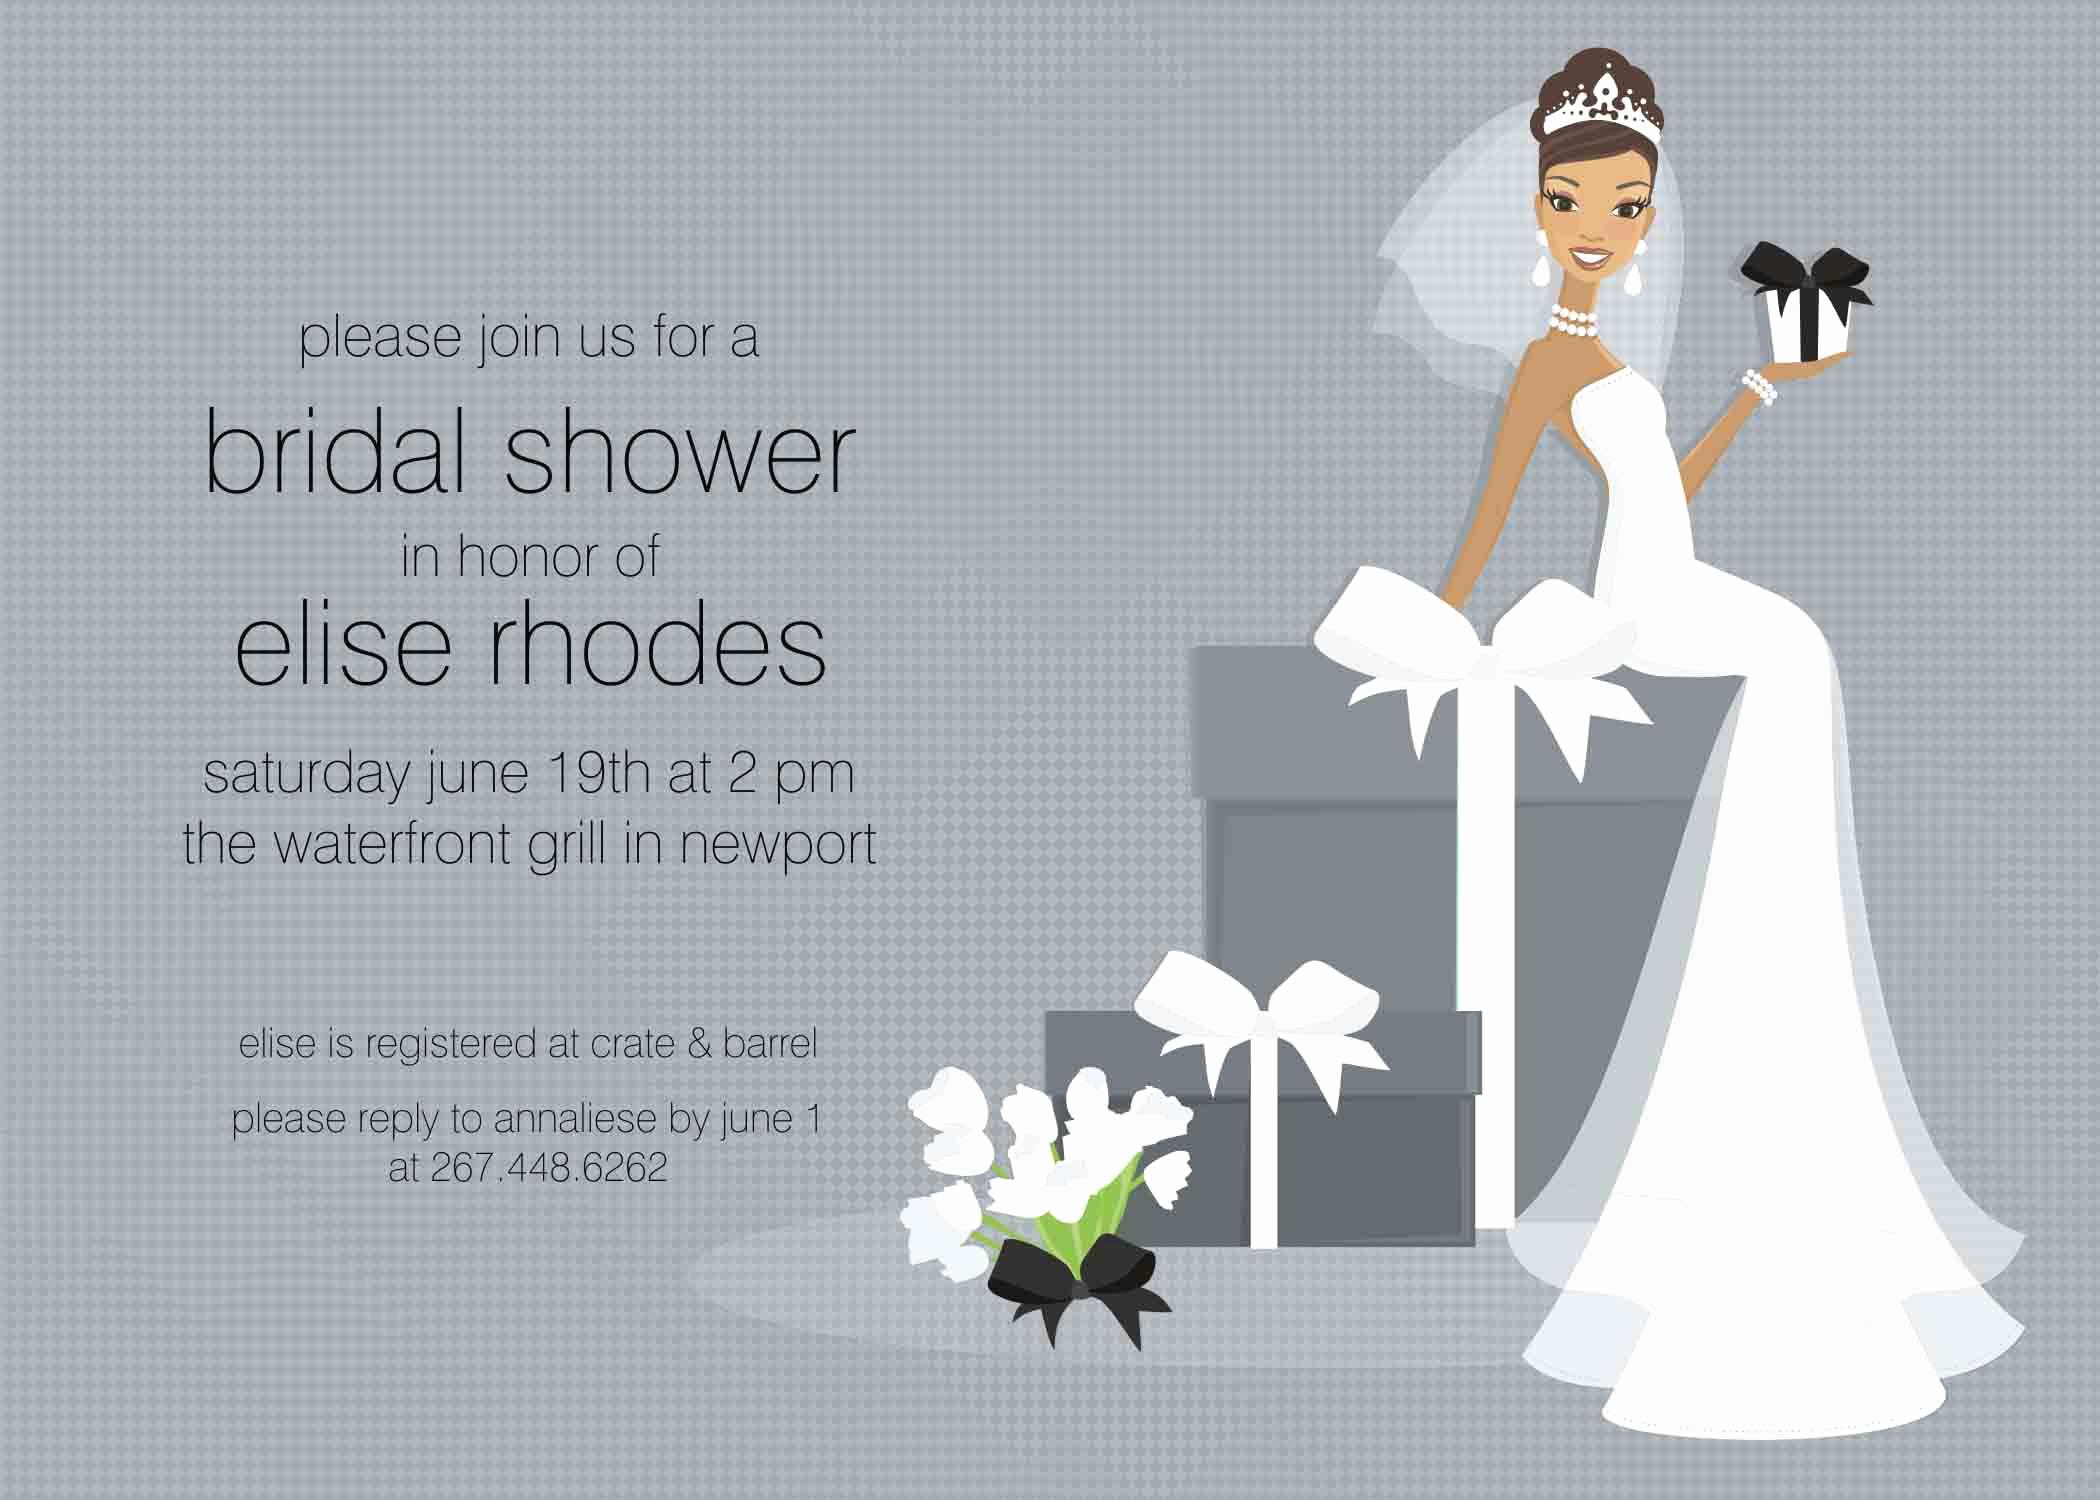 Wedding Shower Invitation Template Lovely Bridal Shower Invite Template Chanel Bridal Shower